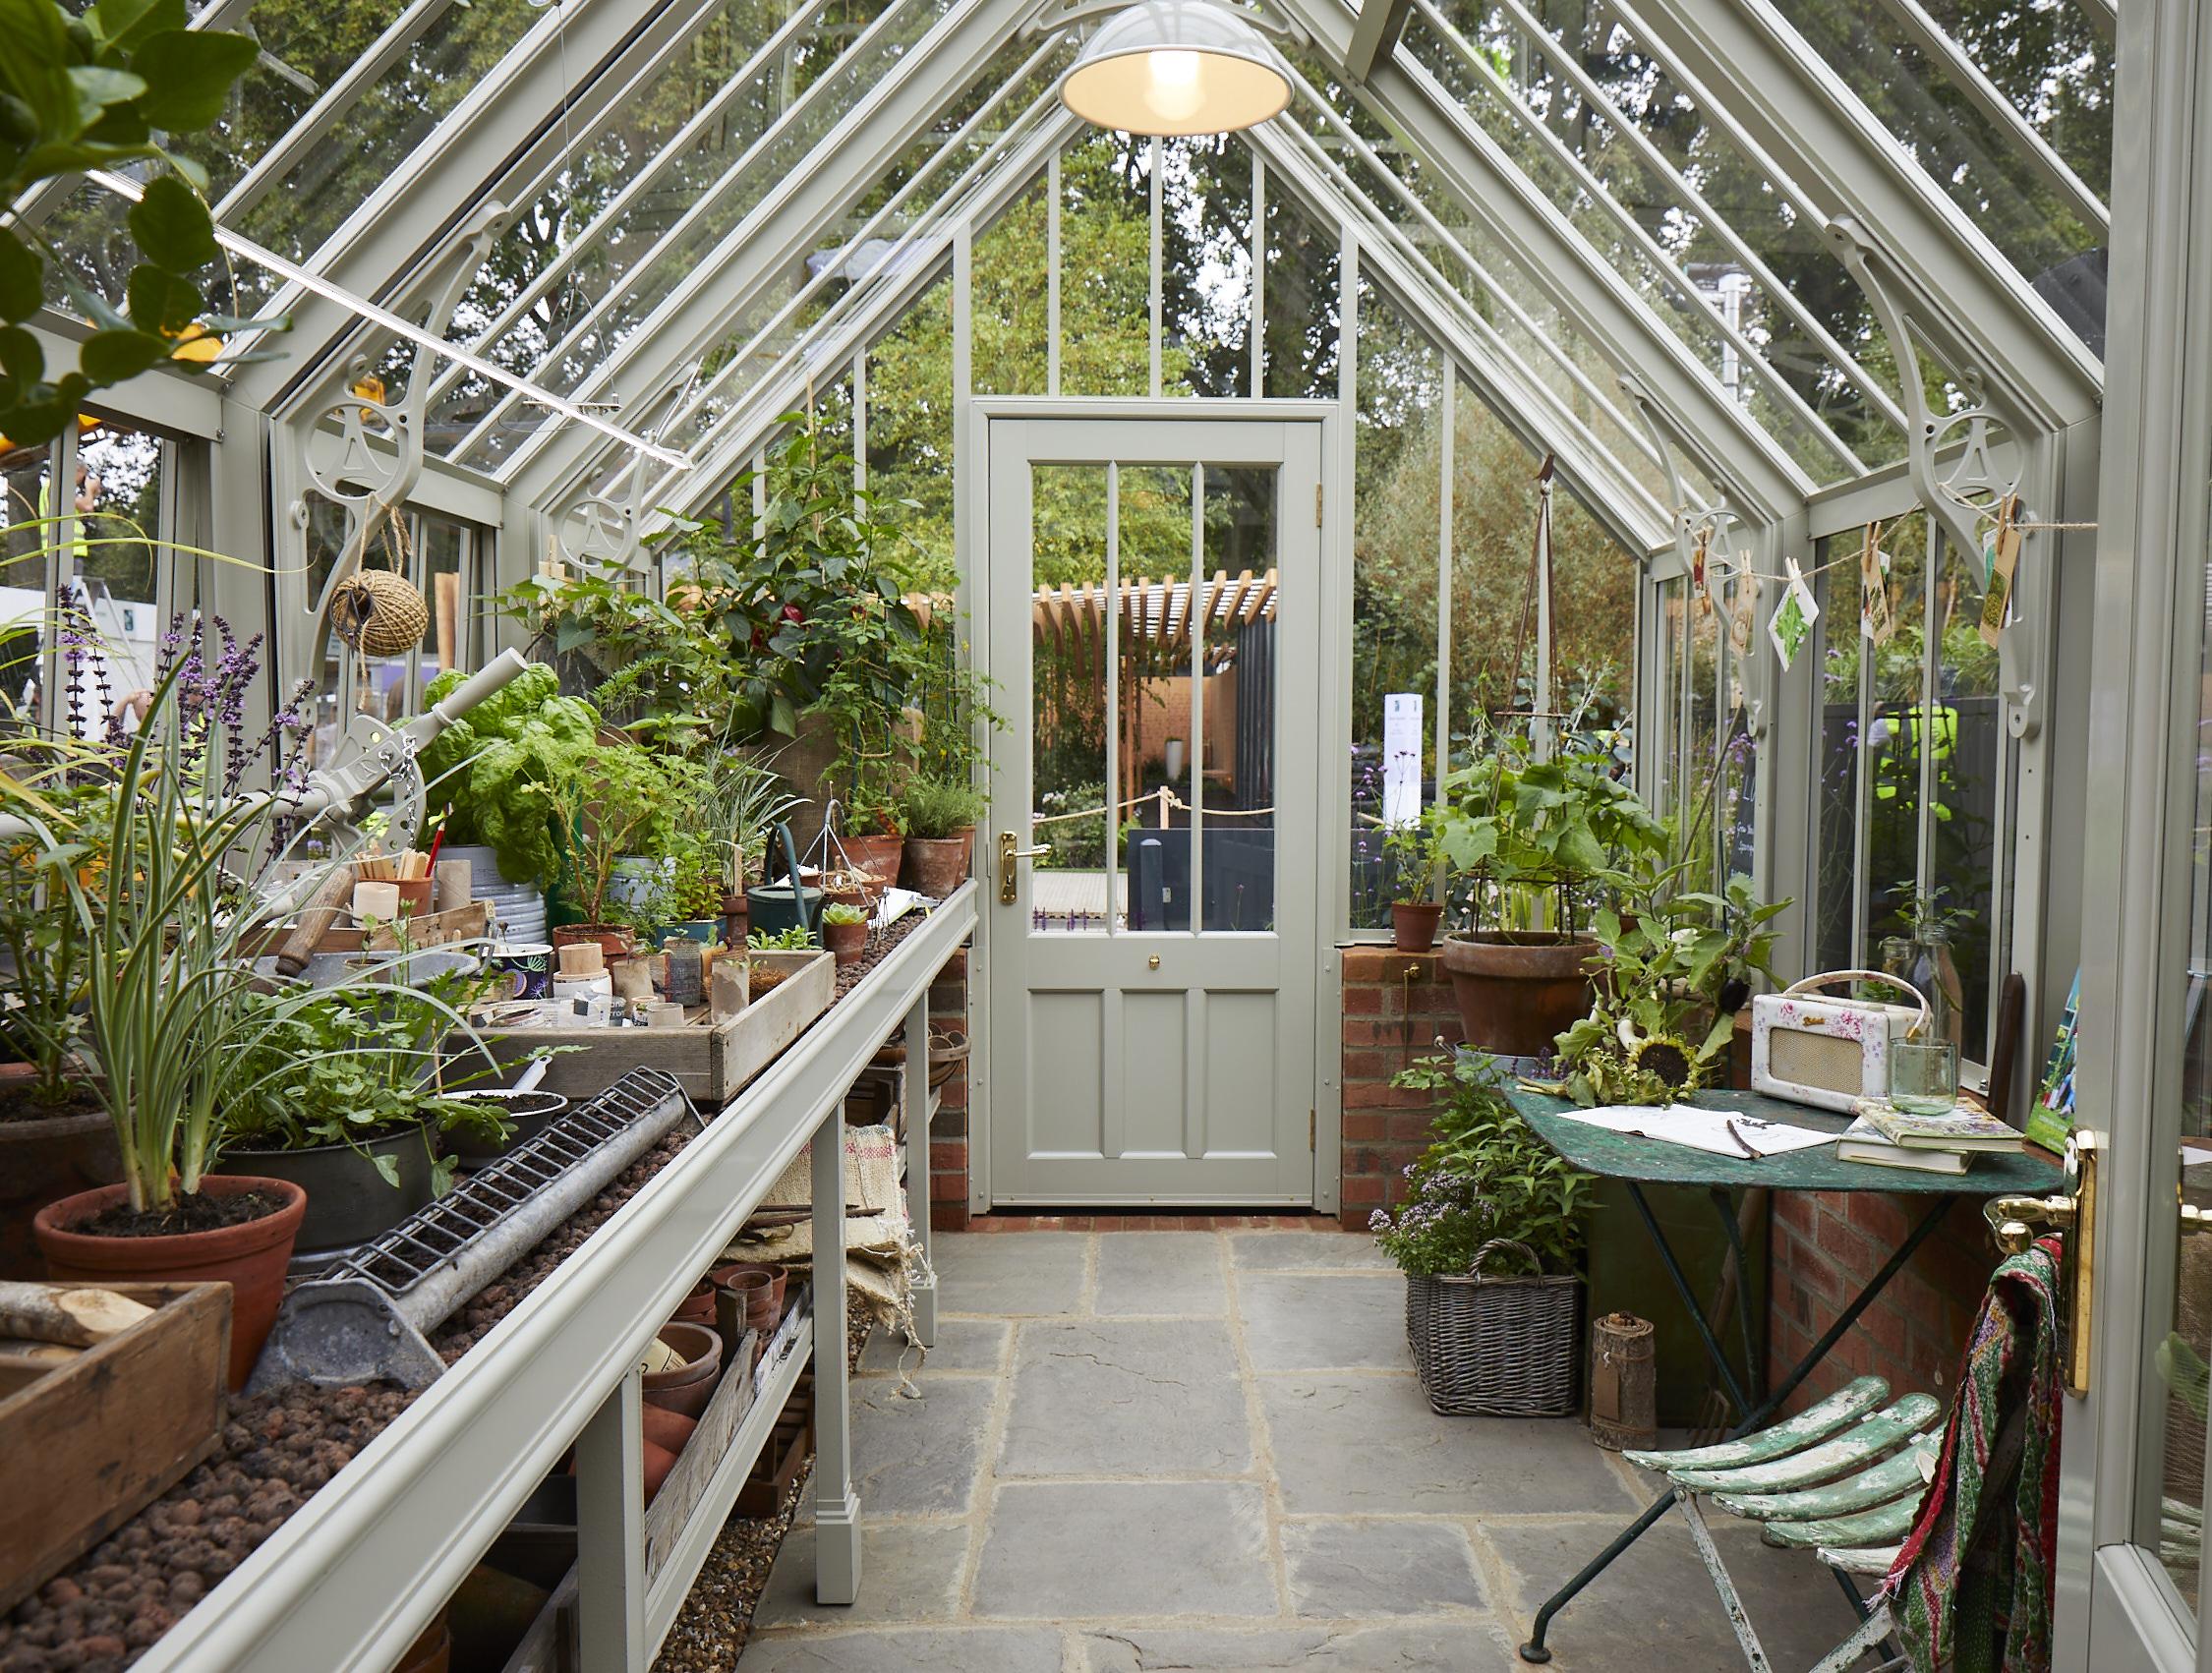 sustainable gardening in scotney greenhouse